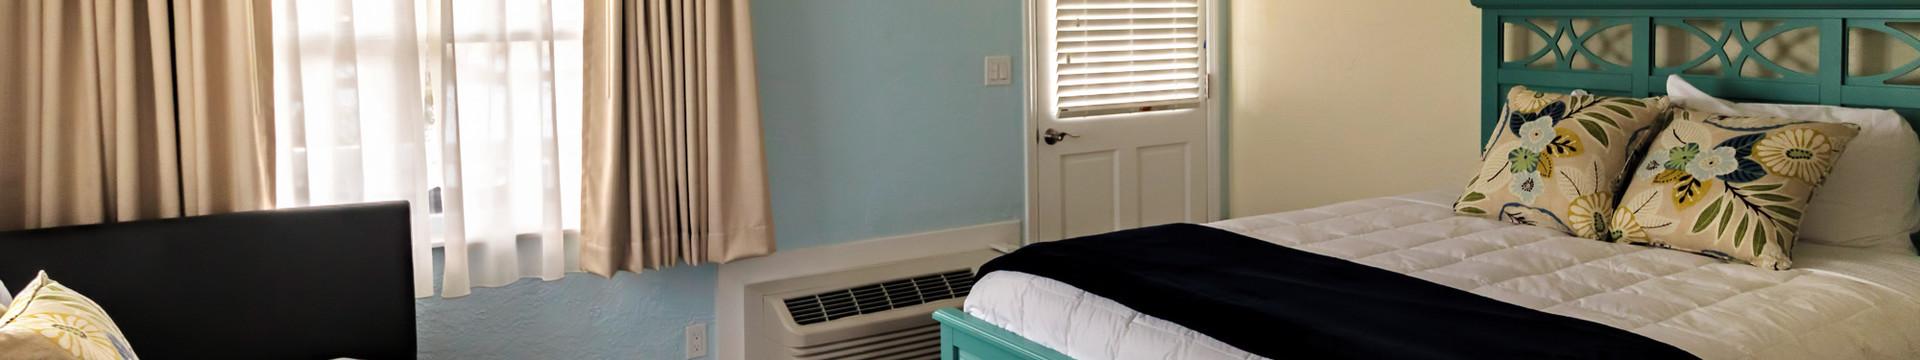 Bedroom in the Sea Grape Suite - Sea View Inn